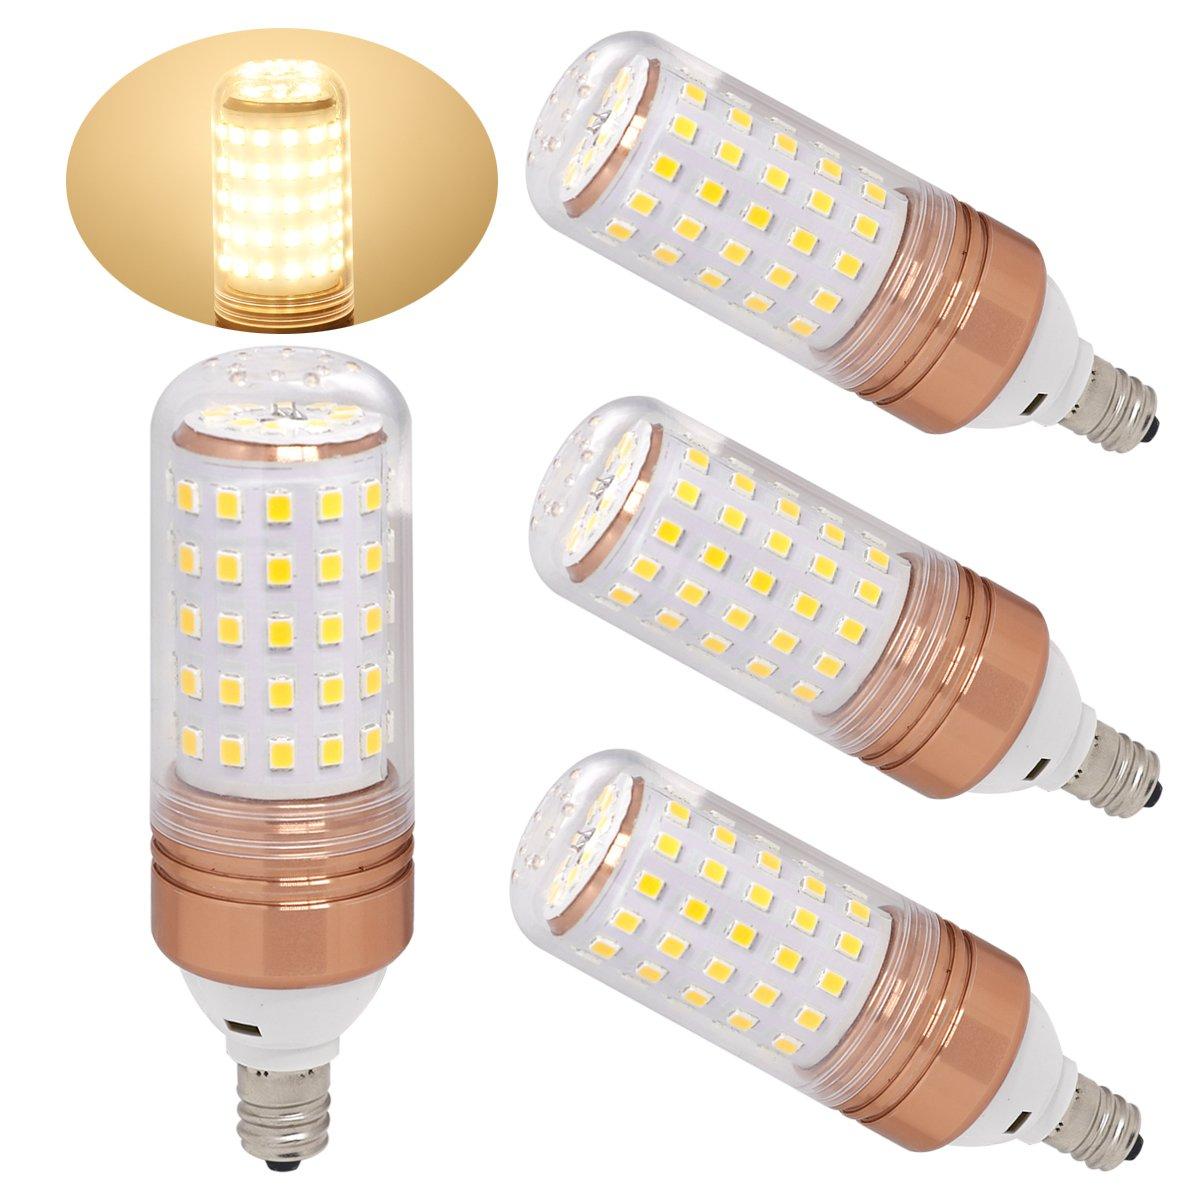 ulight e12 led candelabra bulb 100w halogen bulbs equivalent warm white led 615135216730 ebay. Black Bedroom Furniture Sets. Home Design Ideas